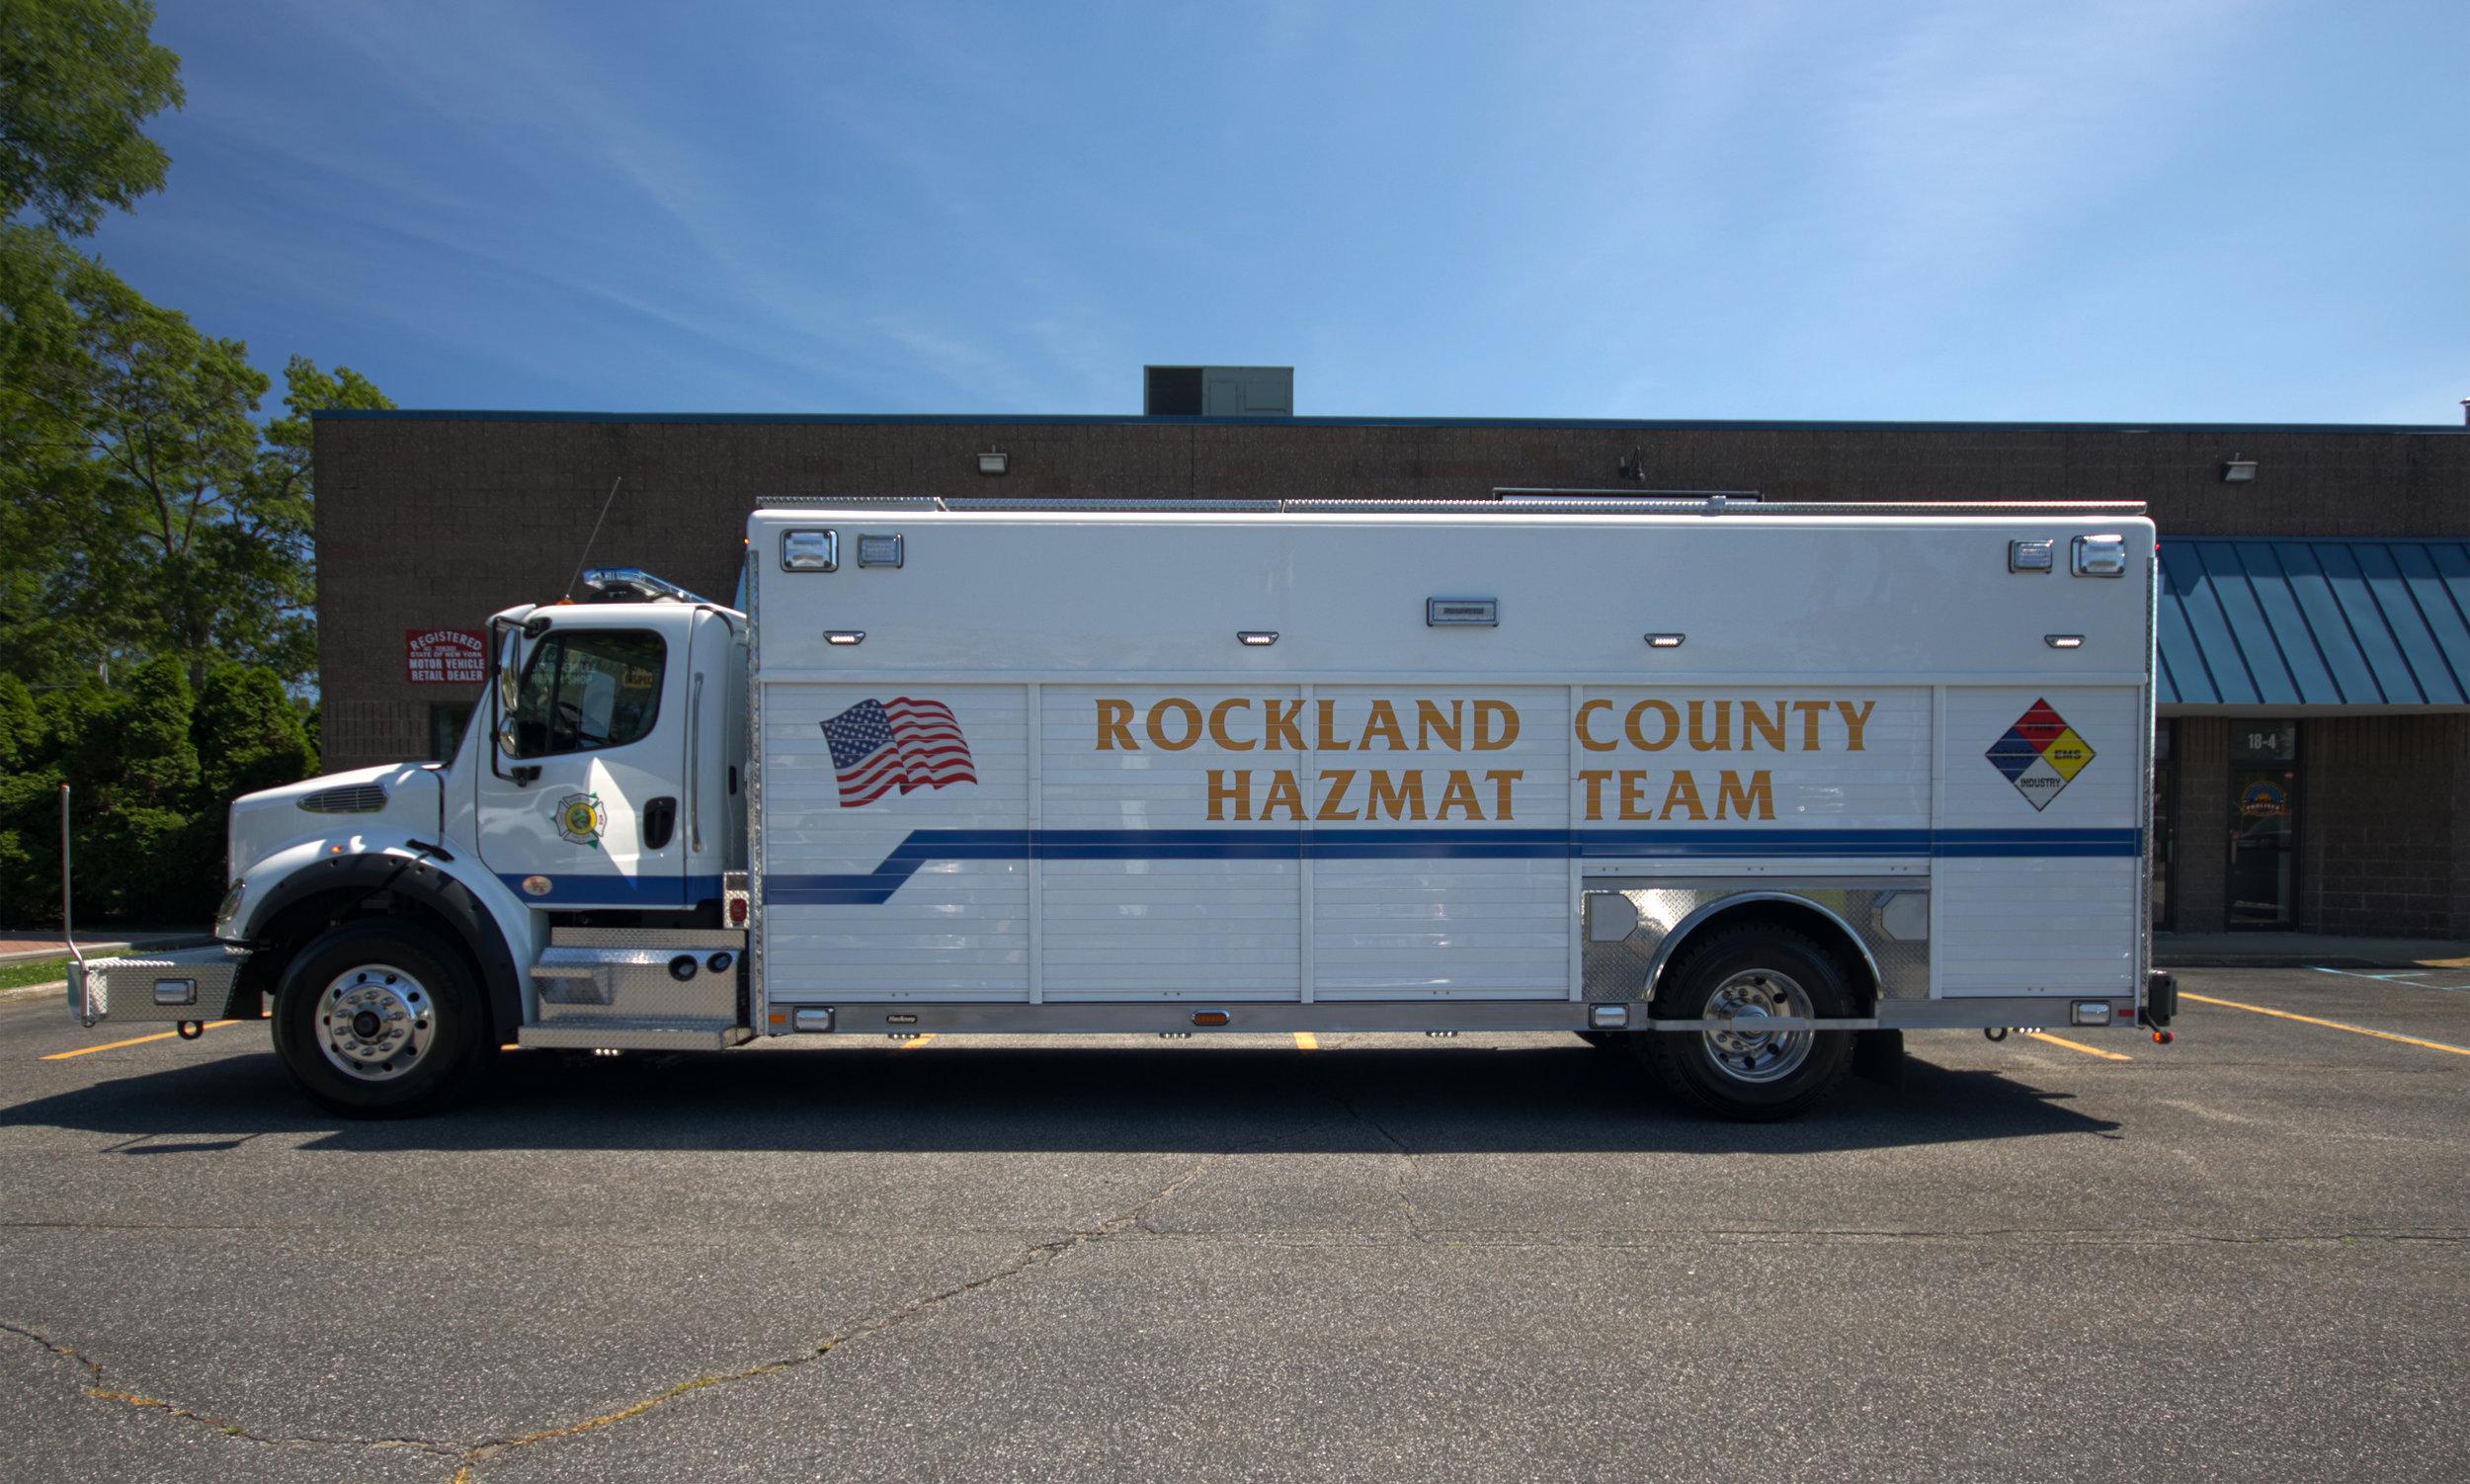 387-rocklandcounty.jpg